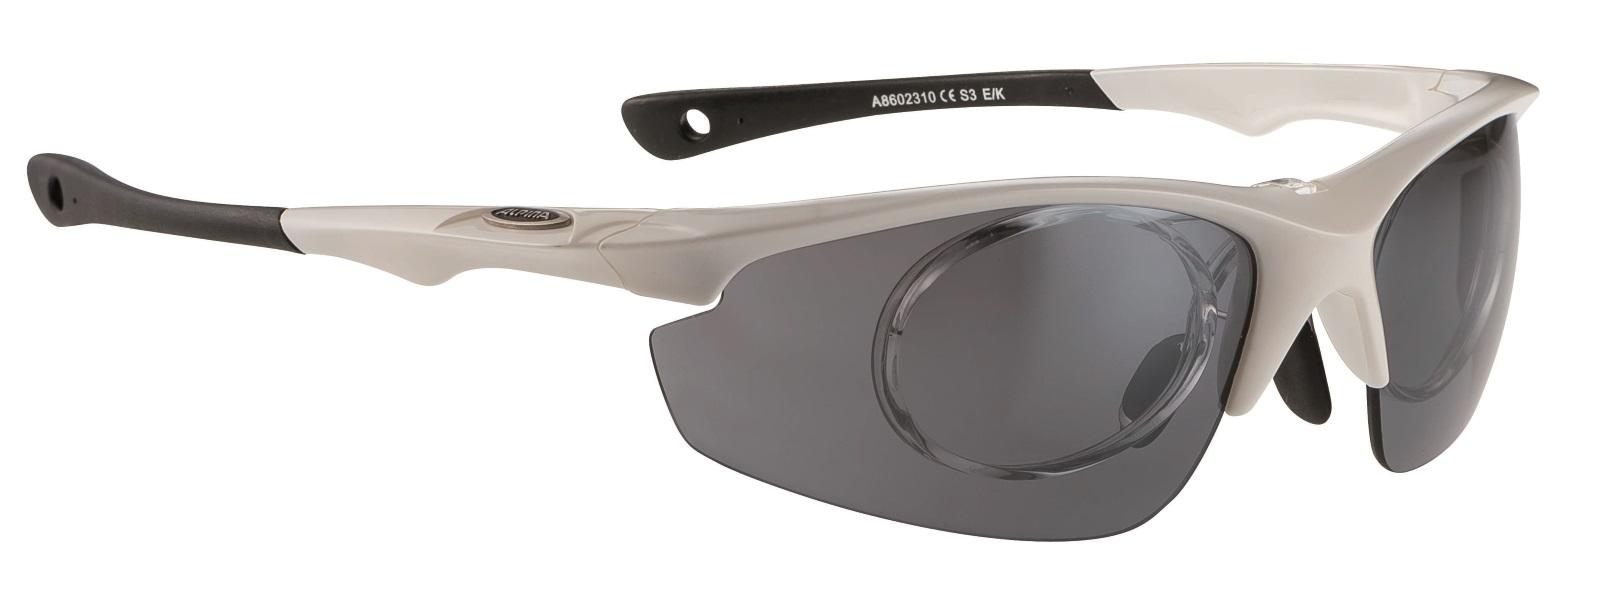 Brillenträger Sportbrille Alpina PSO Tri-Horray A8602 SIpxAVQK5j